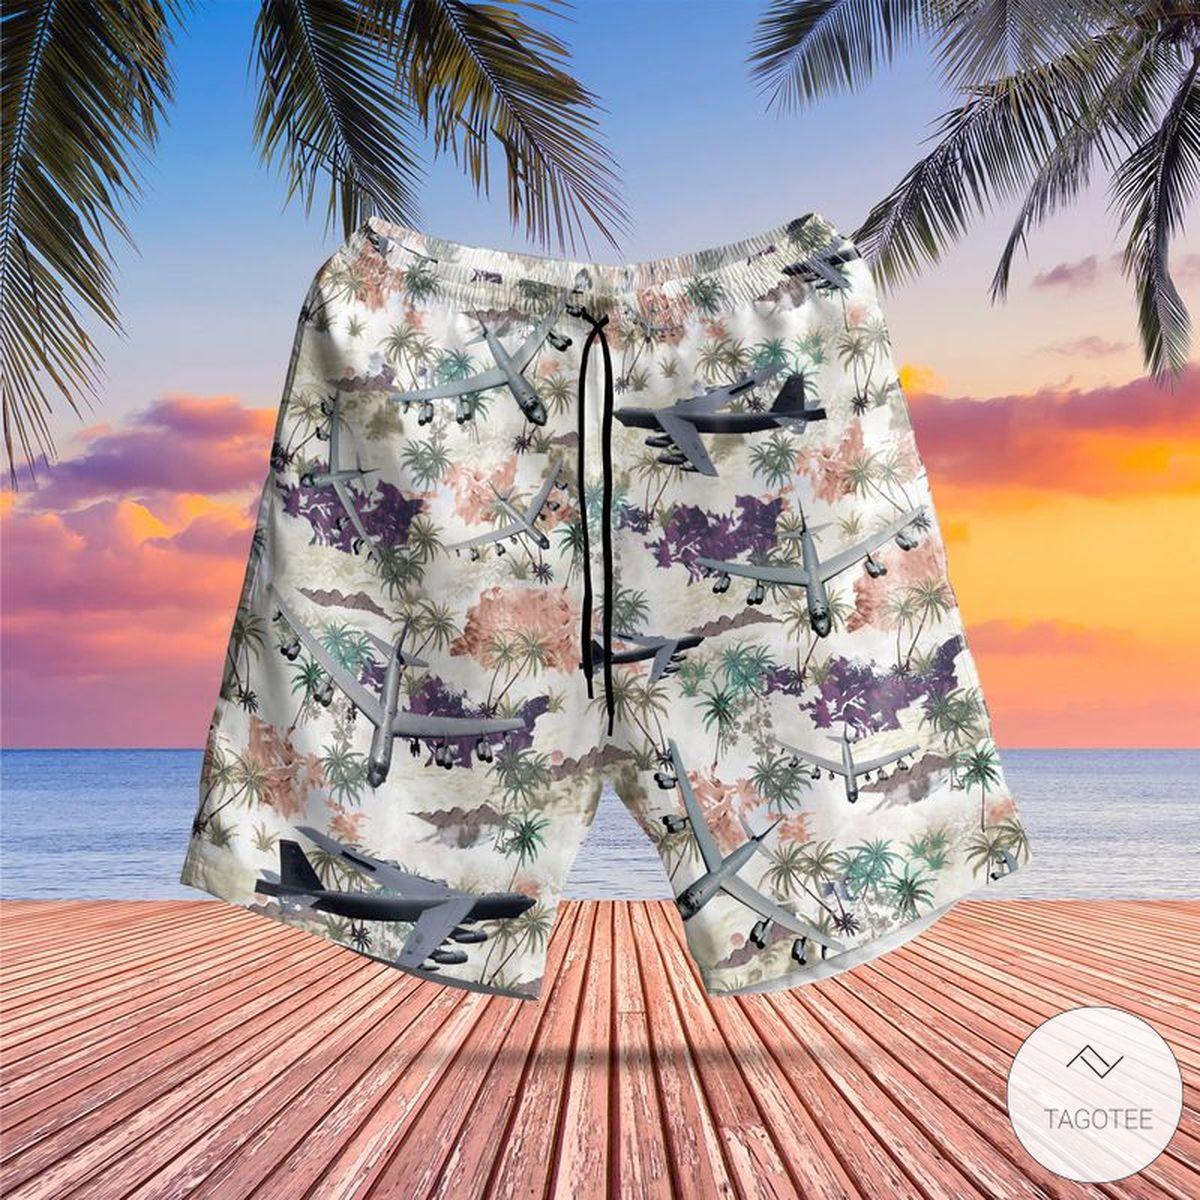 Us Store Air Force Boeing B-52 Stratofortress Hawaiian Shirt, Beach Shorts